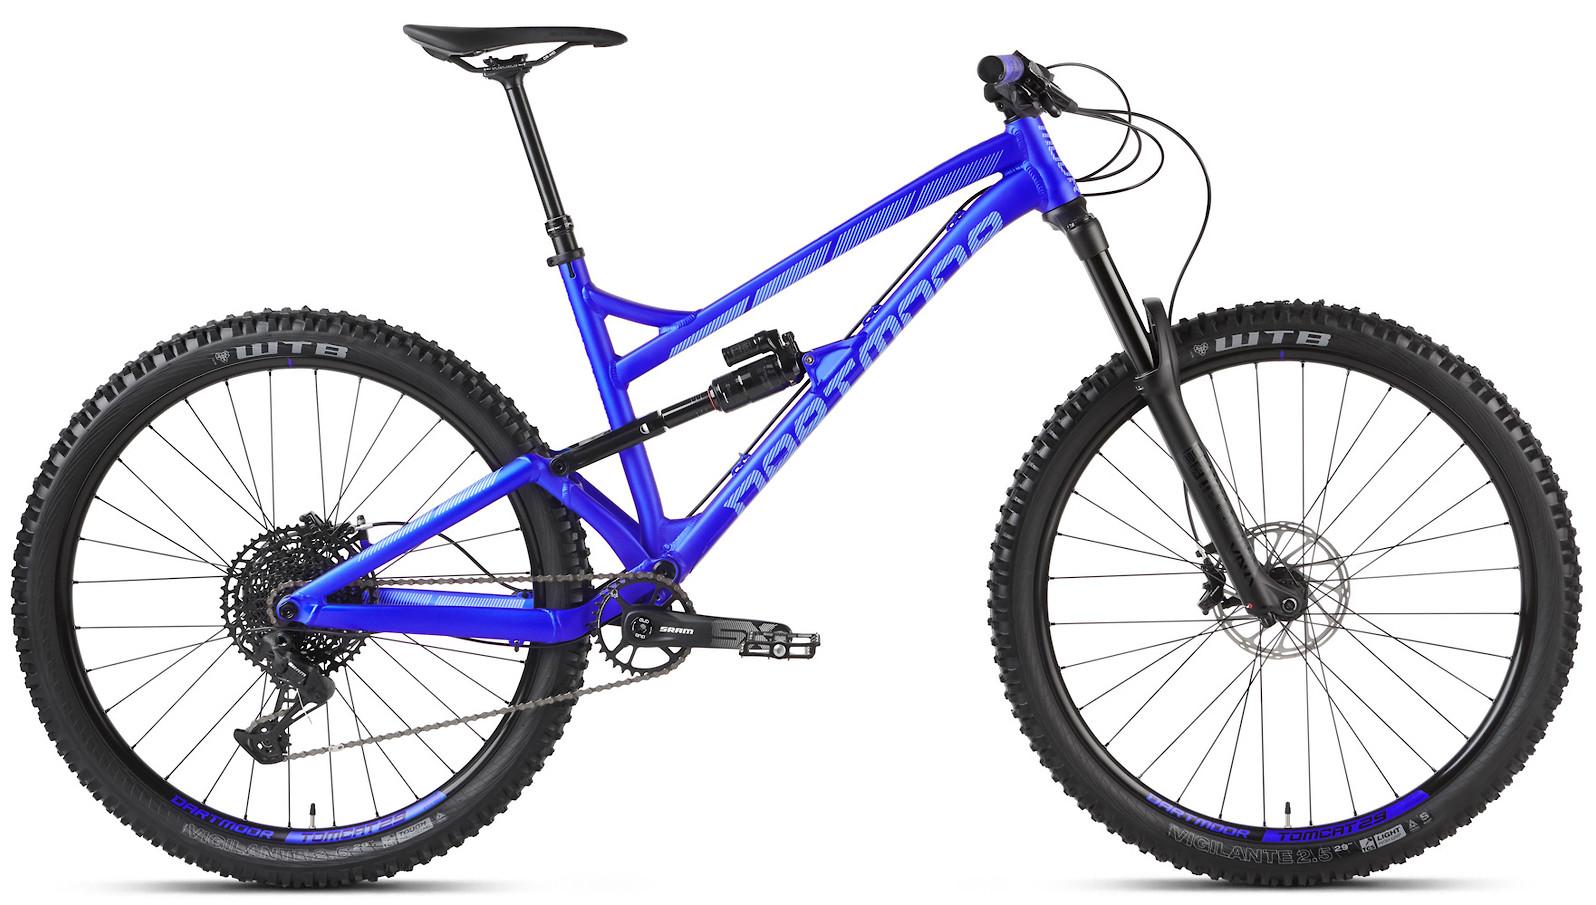 2020 Dartmoor Blackbird EVO 29